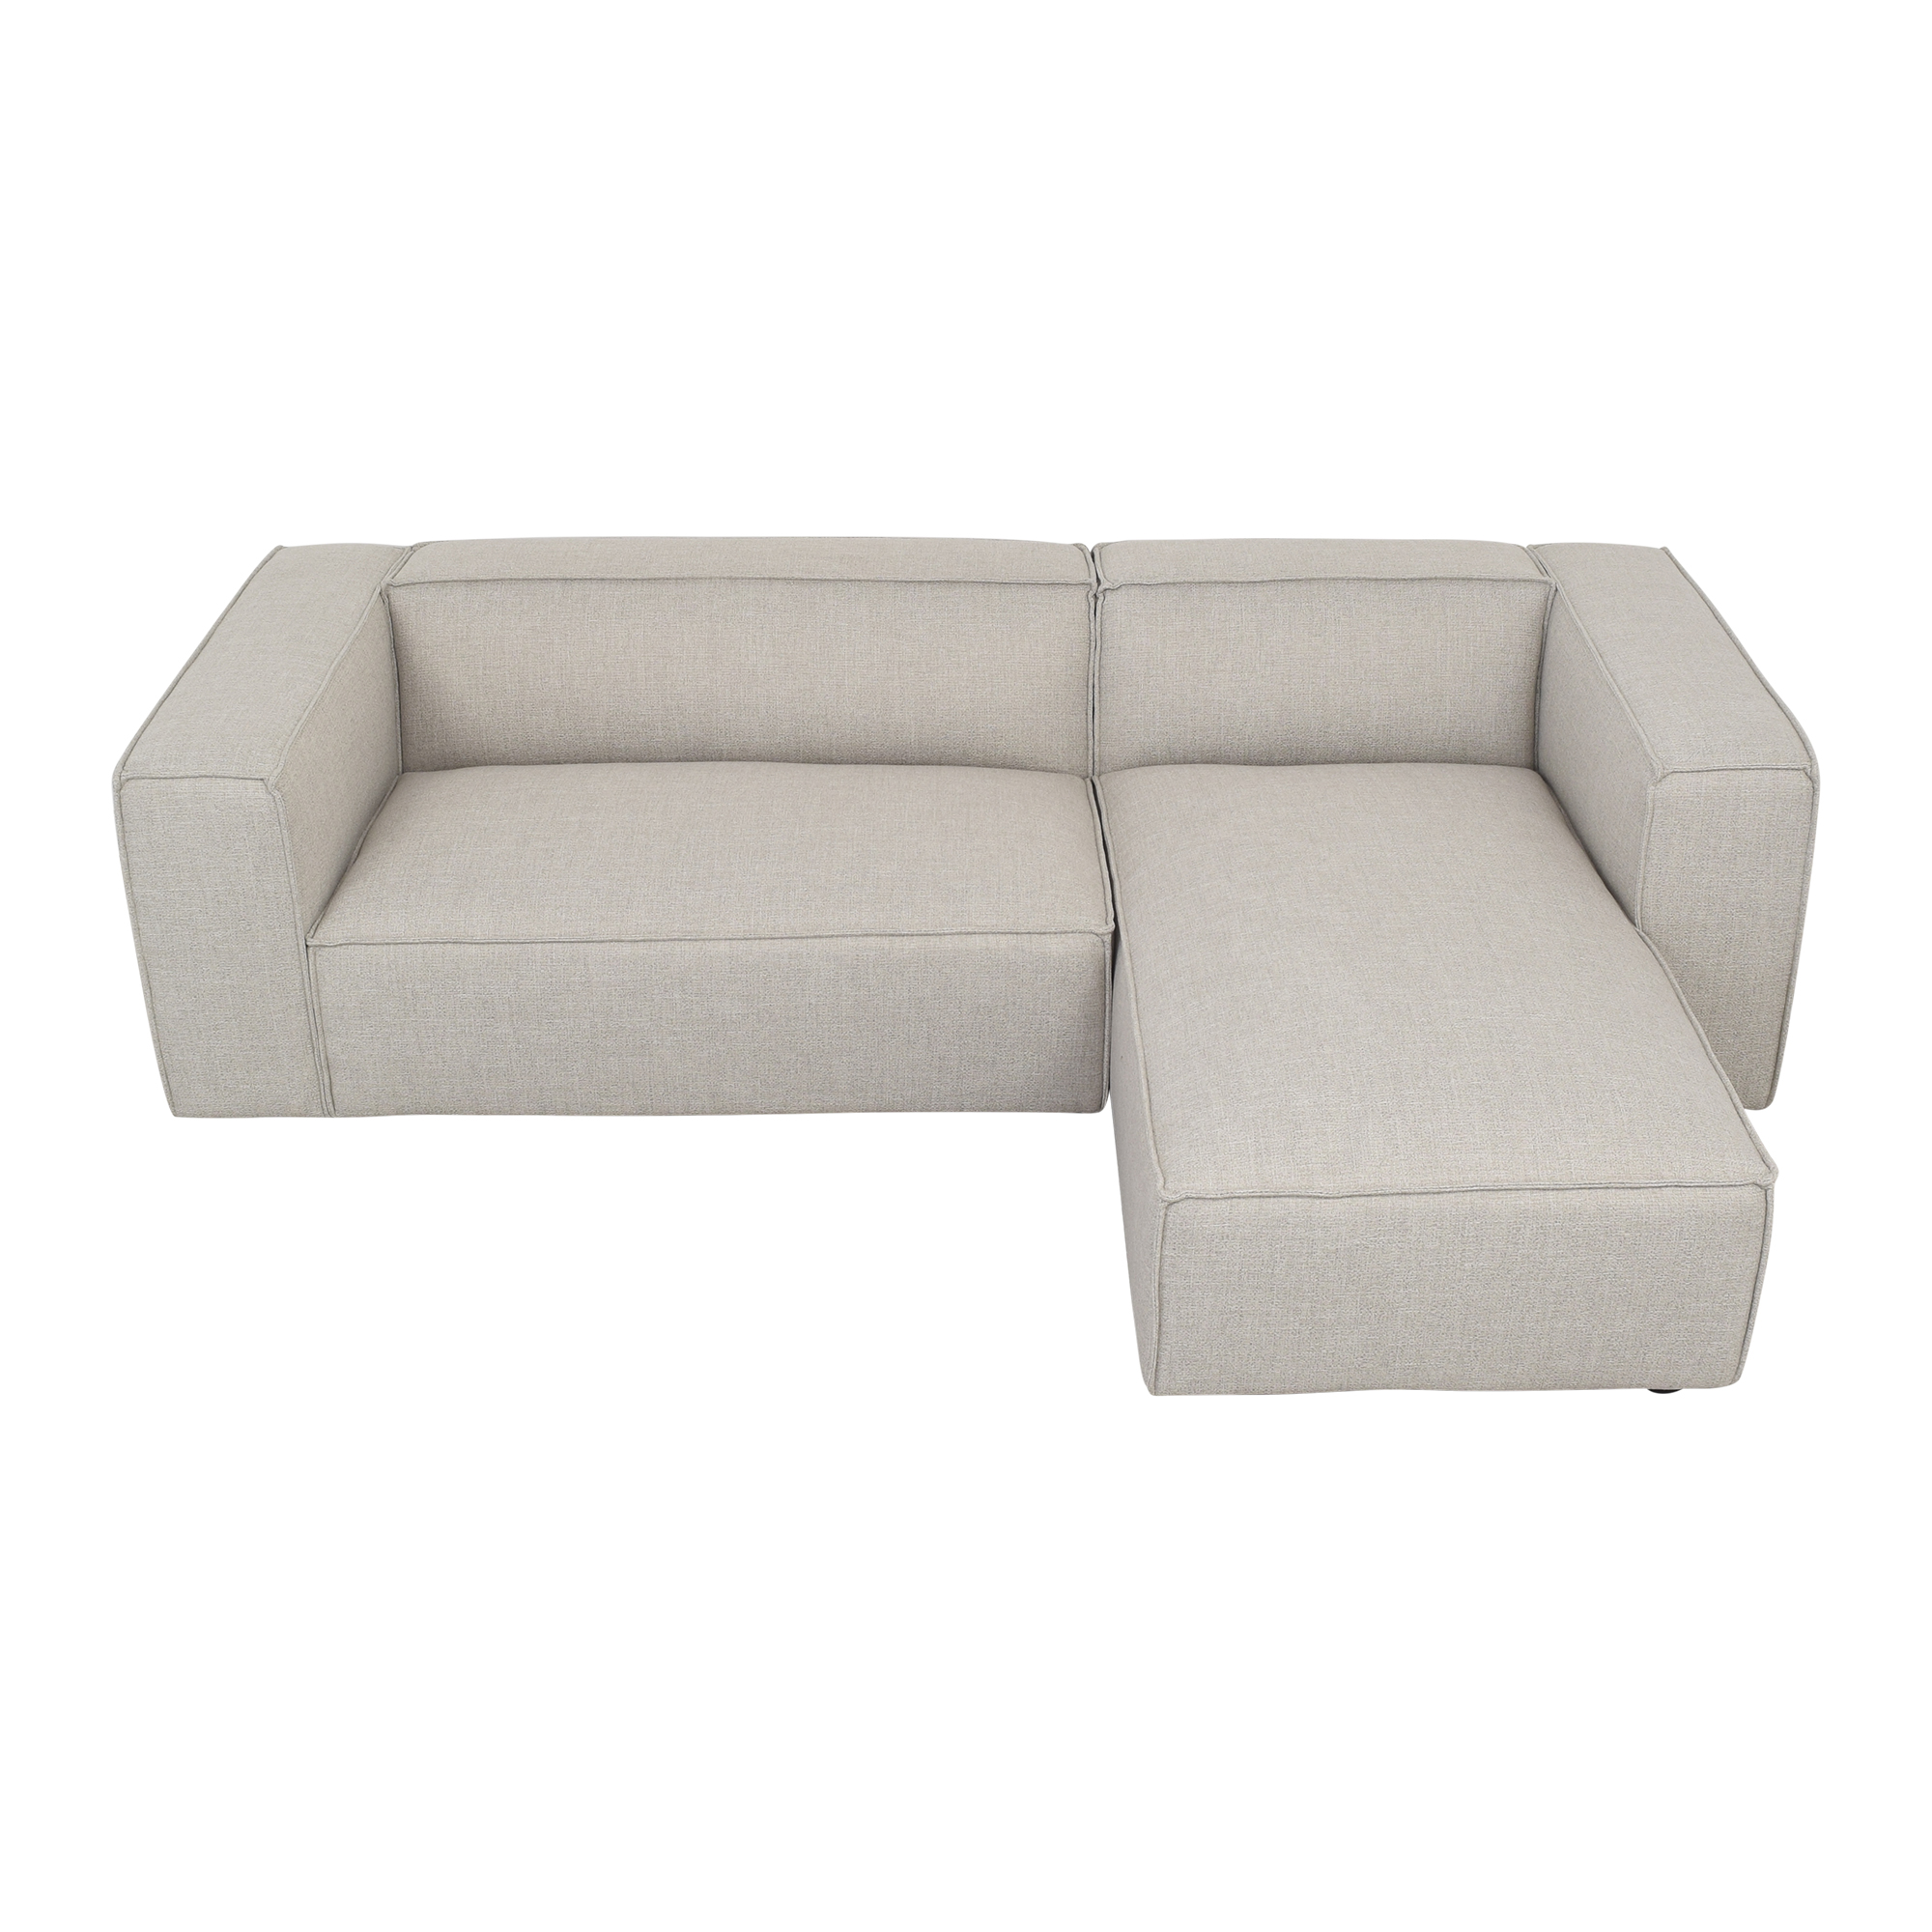 Interior Define Interior Define Gray Sectional Sofa with Chaise ma